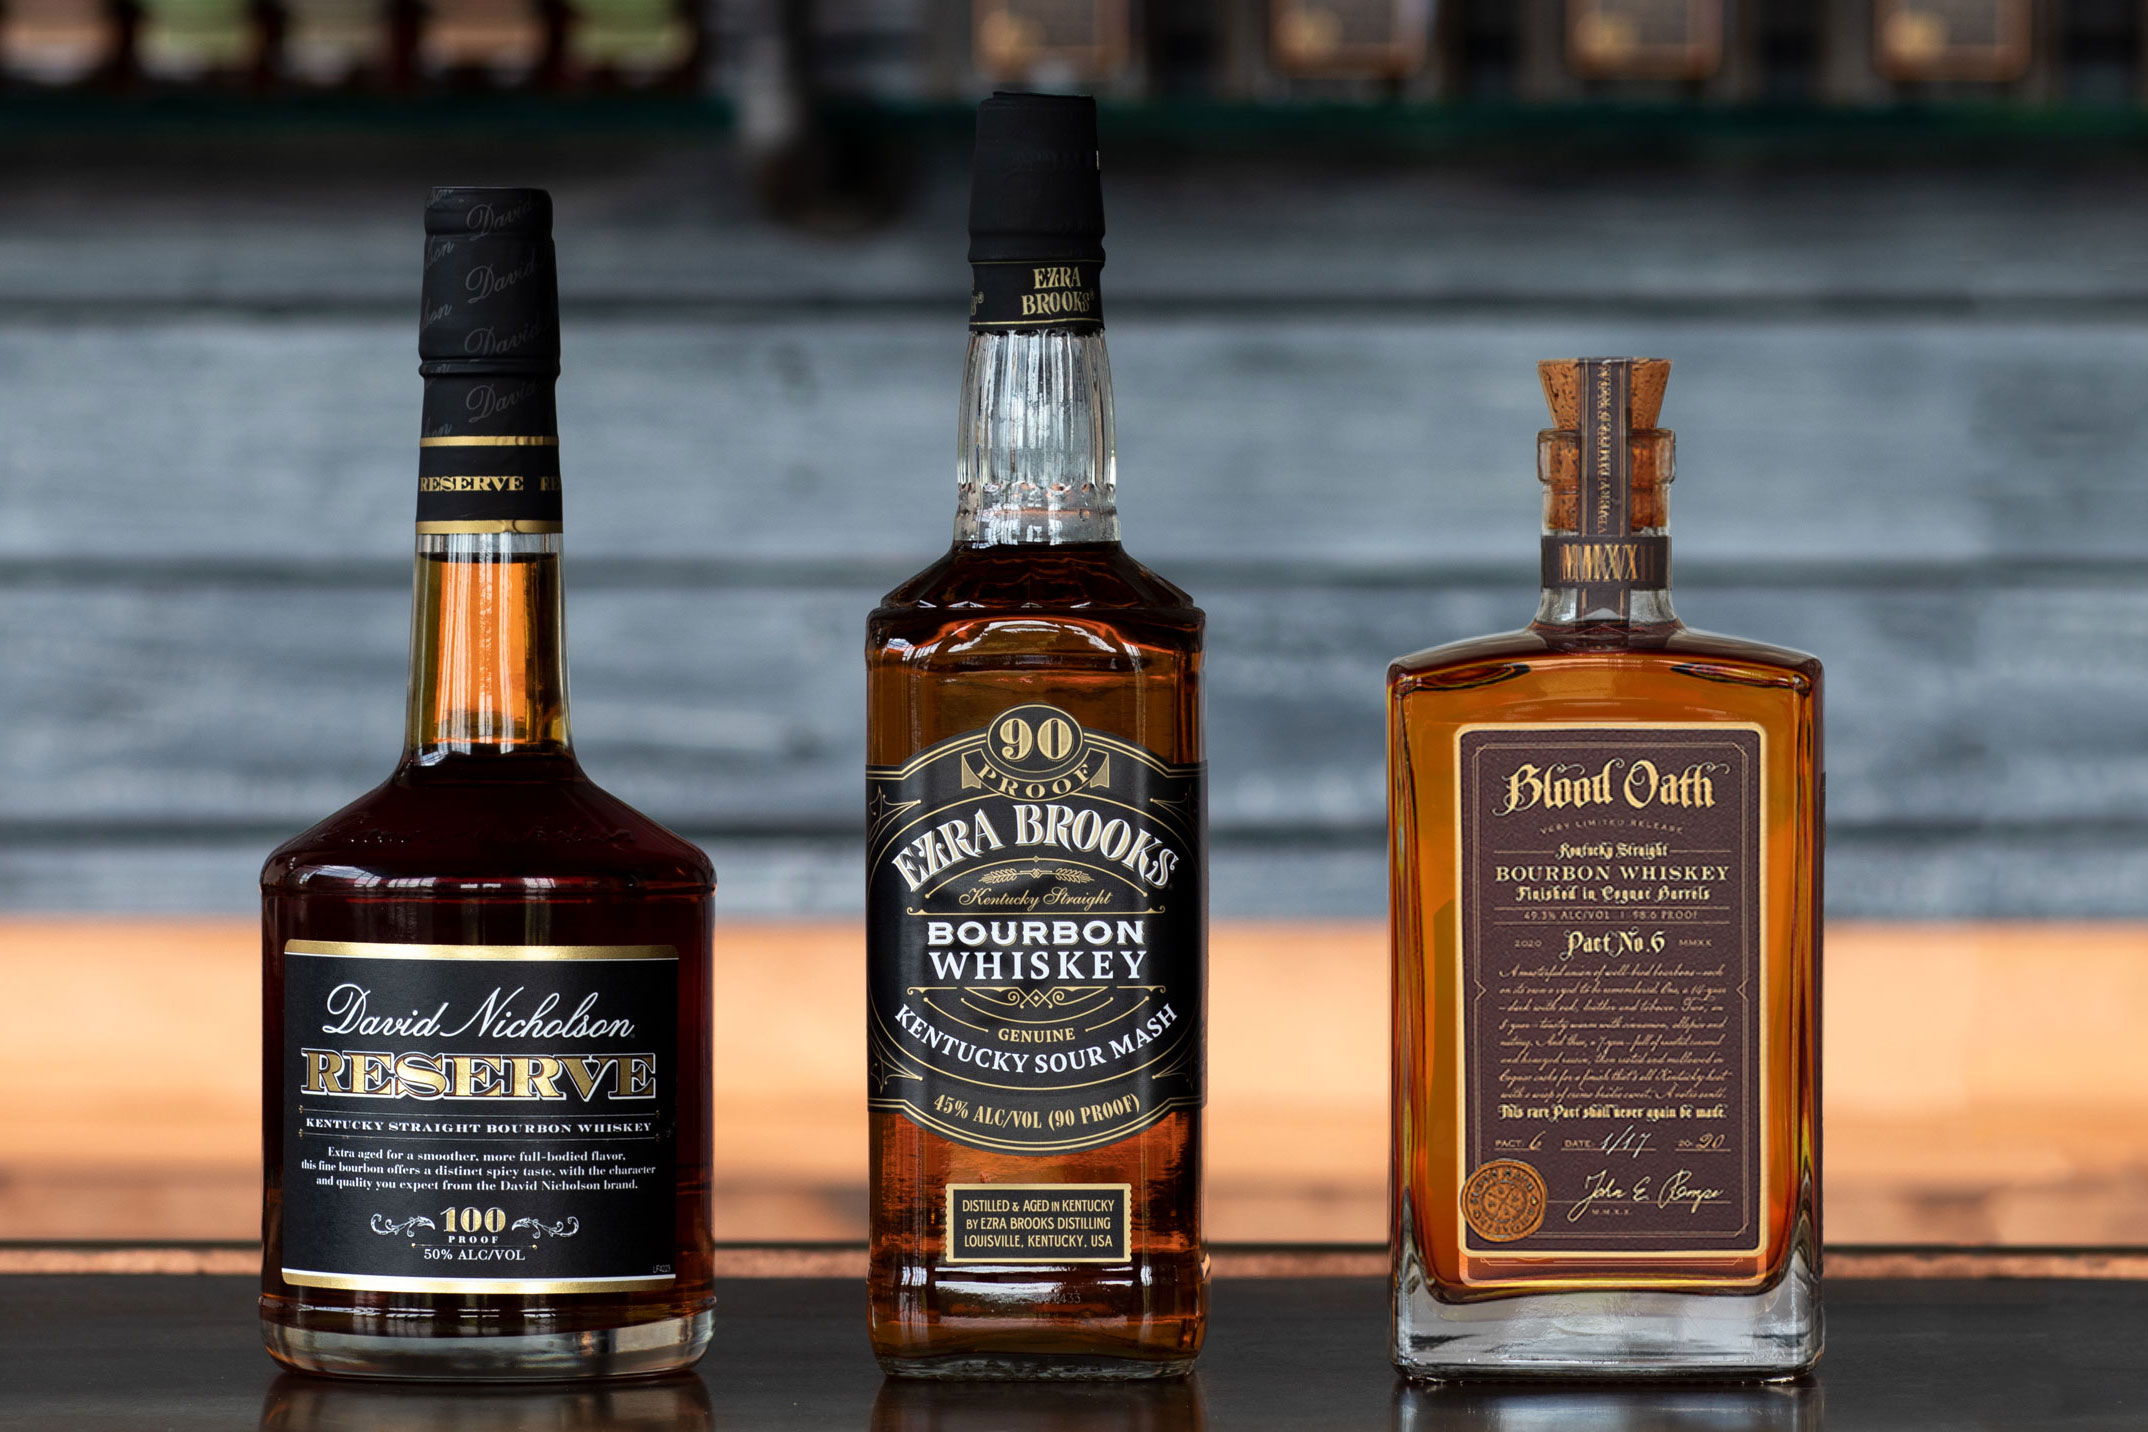 David Nicholson, Ezra Brooks, and Blood Oath bourbon